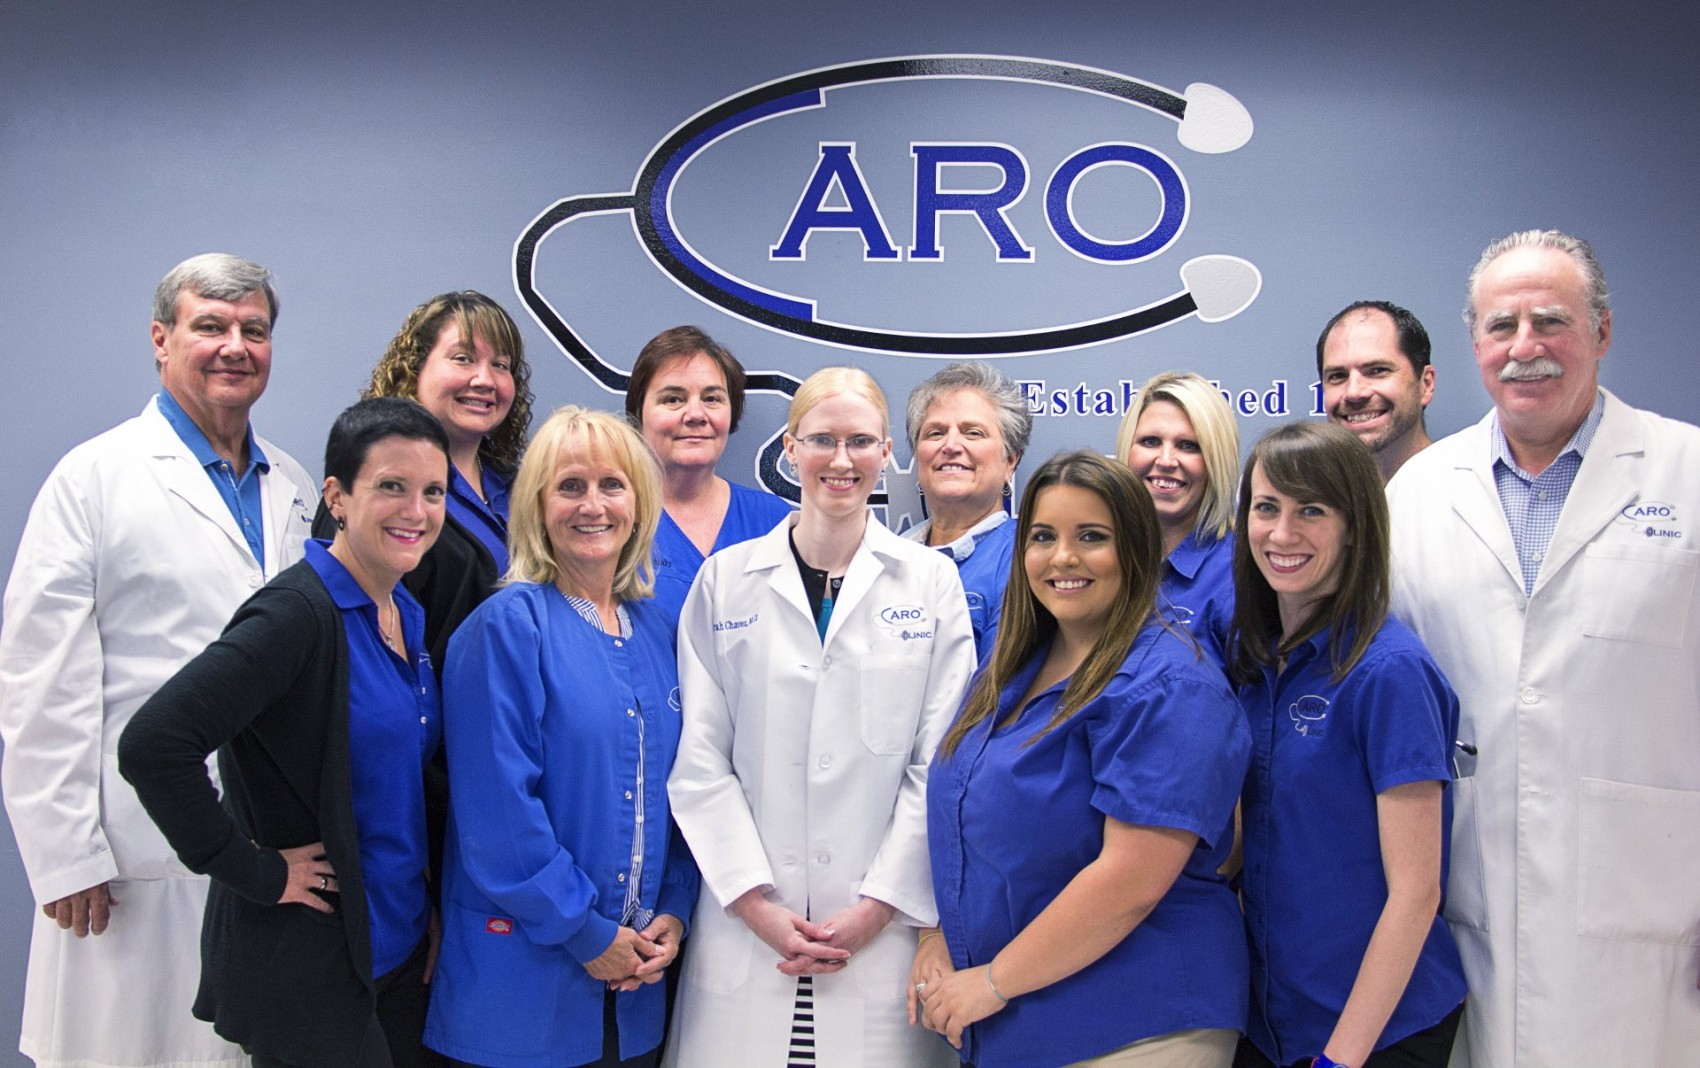 Caro Clinic Staff